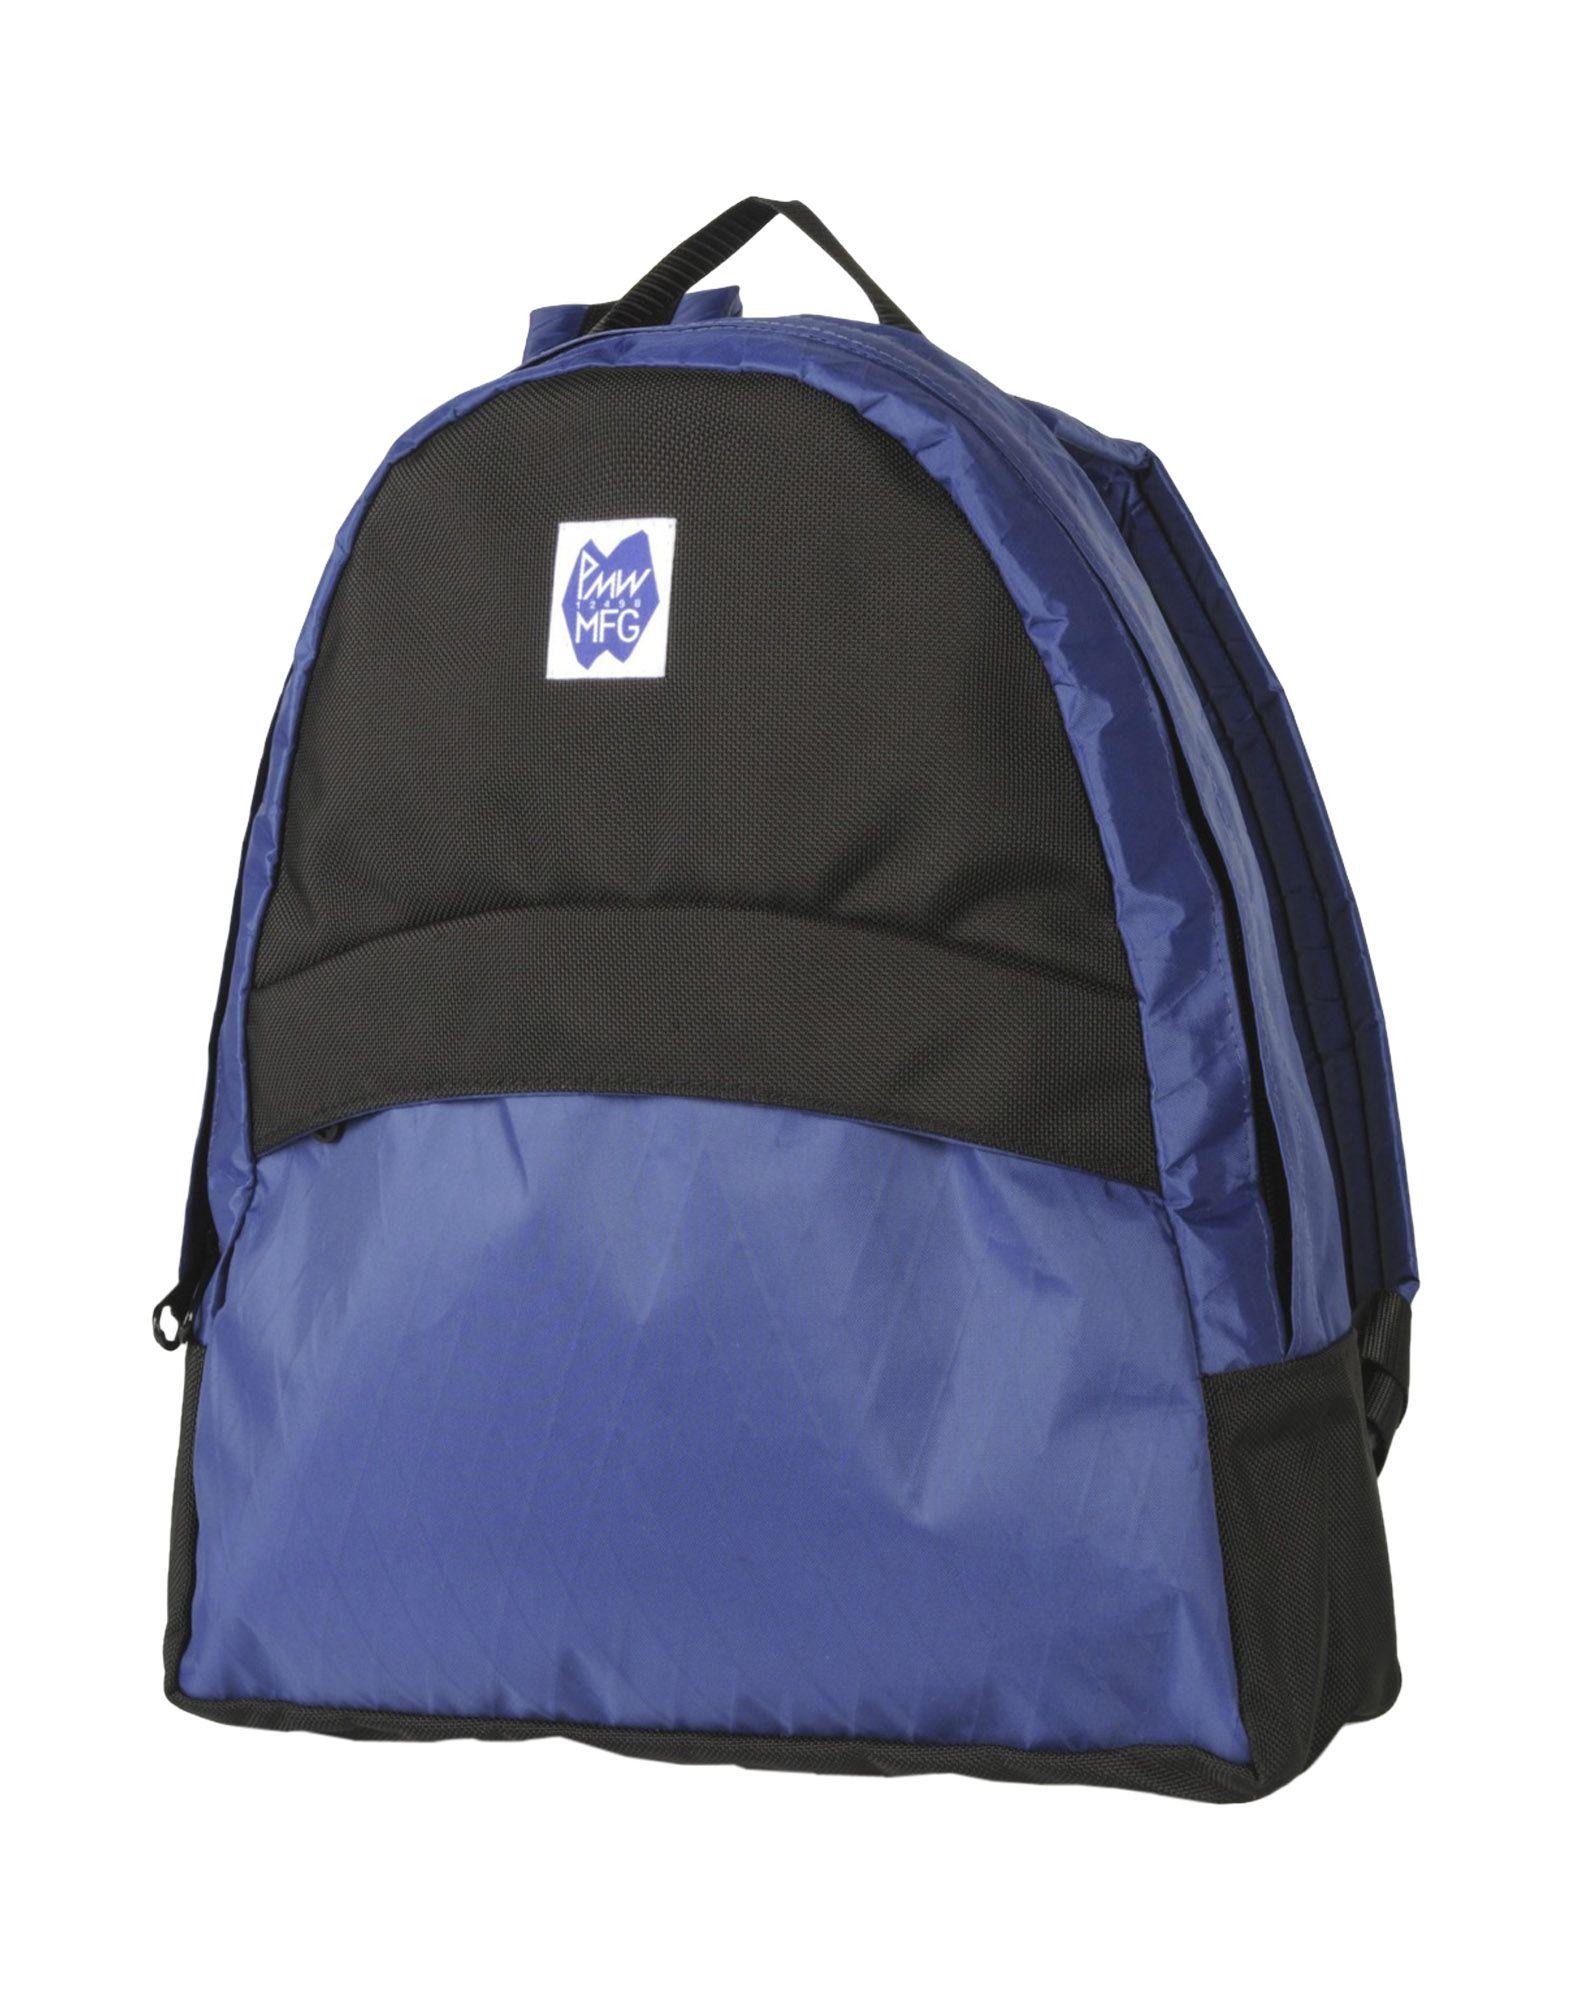 PMW MFG Рюкзаки и сумки на пояс real capacity bp u60 bp u60 rechargeable camera battery for sony pmw 100 pmw 200 pmw ex1 pmw ex1r pmw ex3 pmw ex260 pmw ex3r